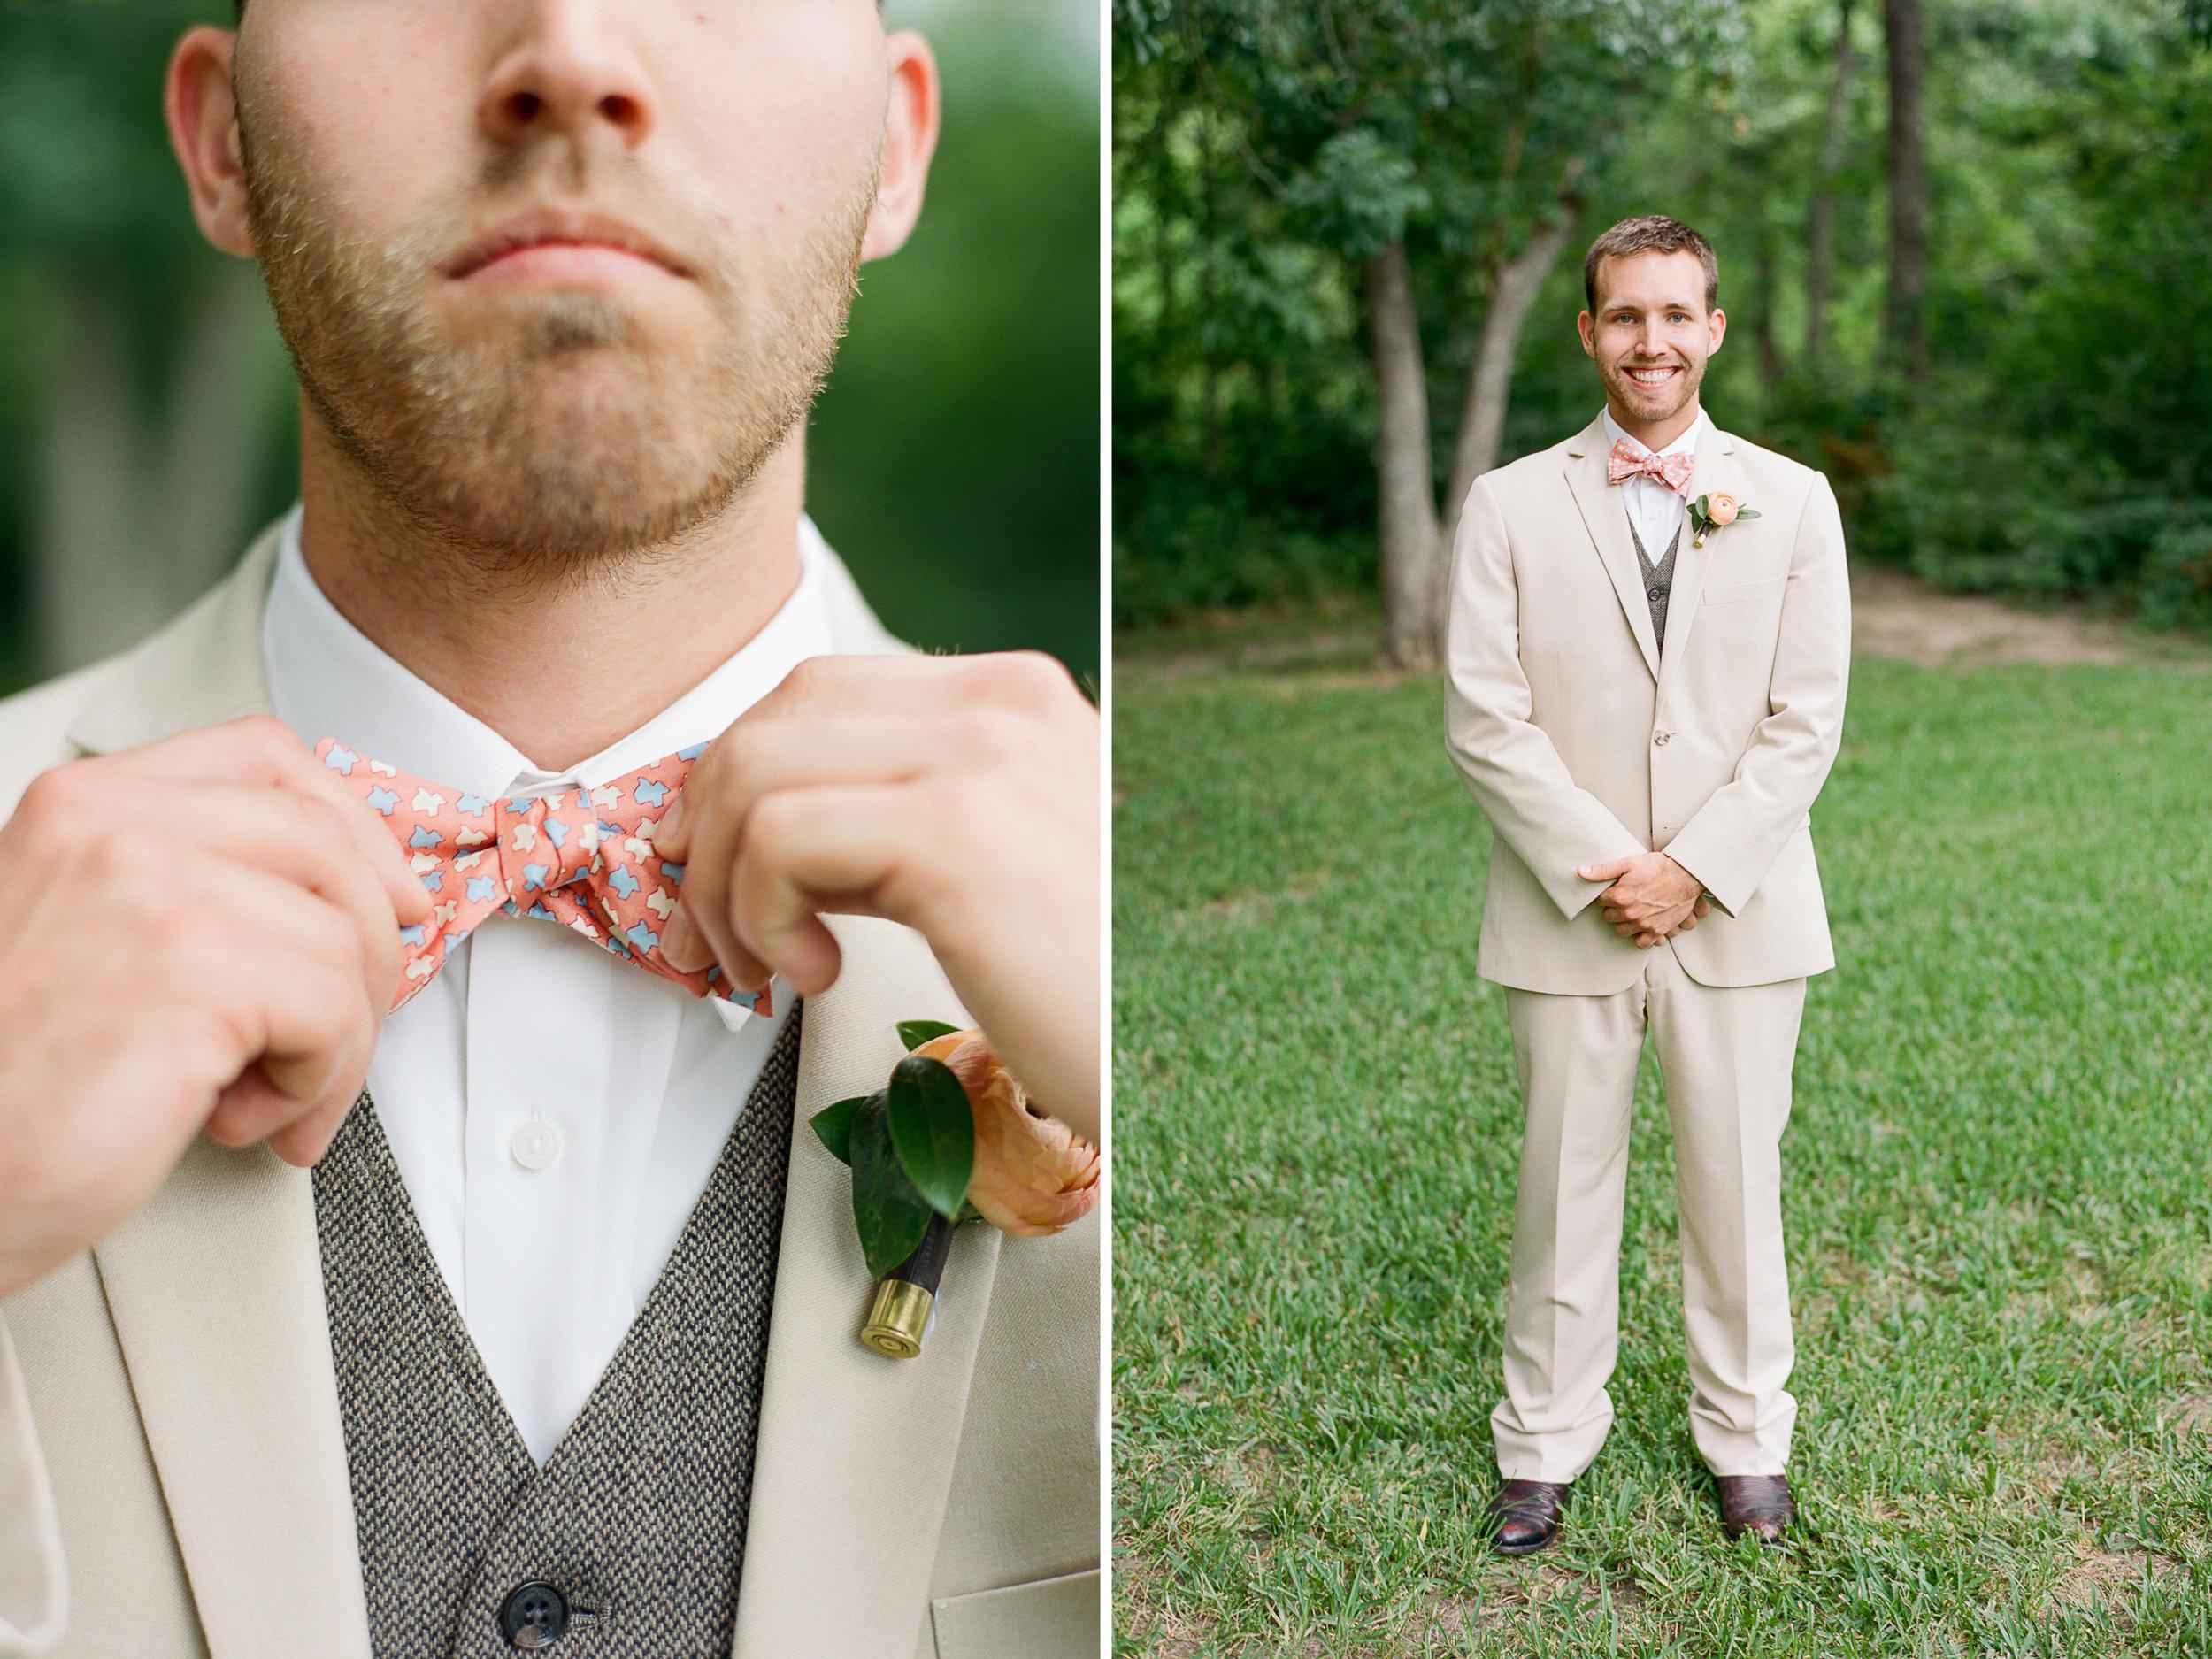 The-Knot-Wedding-Houston-Photographer-Fine-Art-Dana-Fernandez-Photography-Film-120.jpg